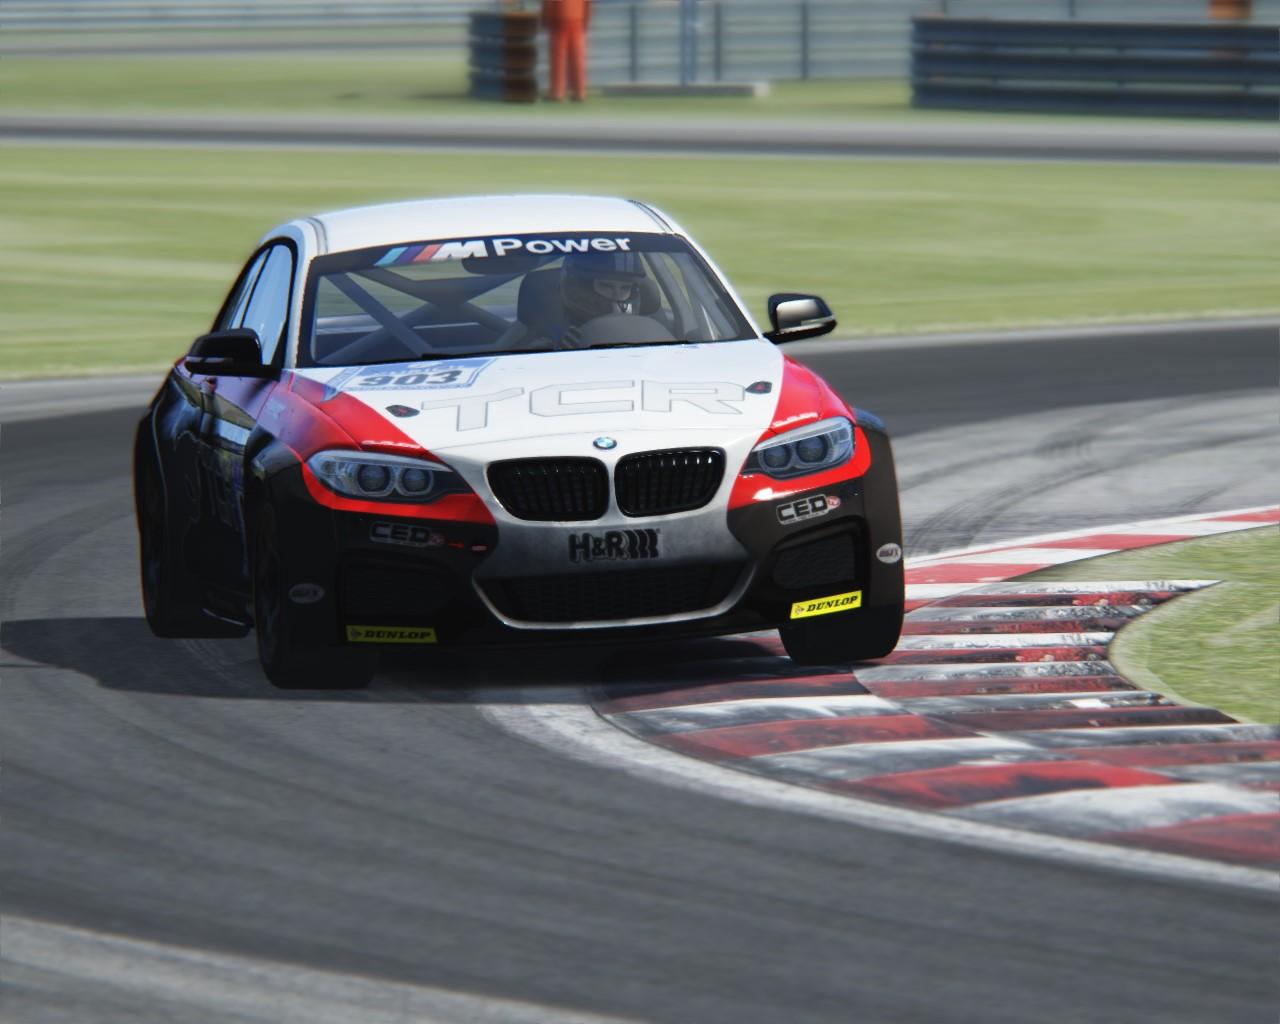 Screenshot_ks_bmw_m235i_racing_magione_15-3-116-21-20-9.jpg